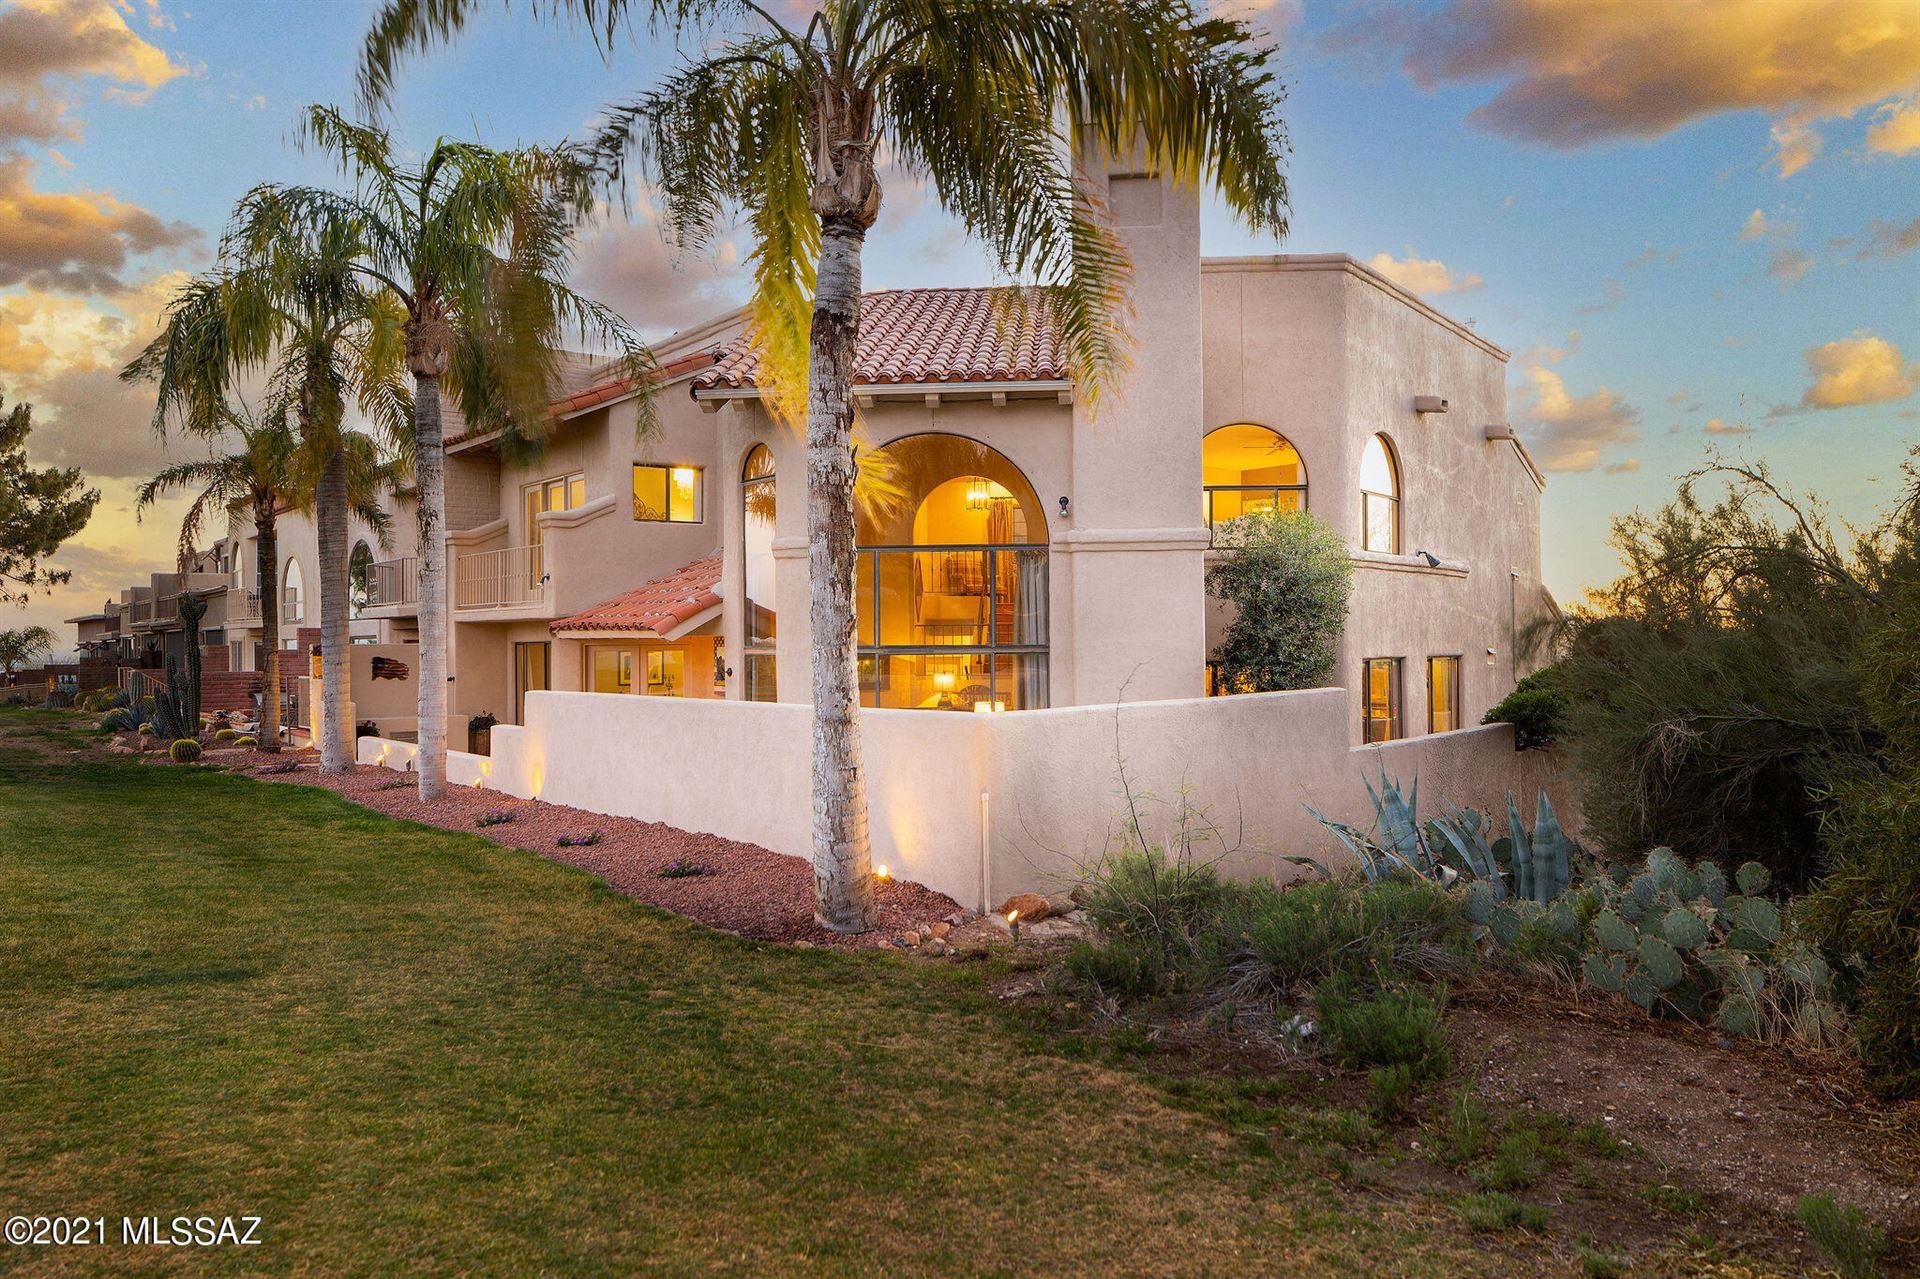 6560 N Turnberry Drive, Tucson, AZ 85718 - MLS#: 22108095